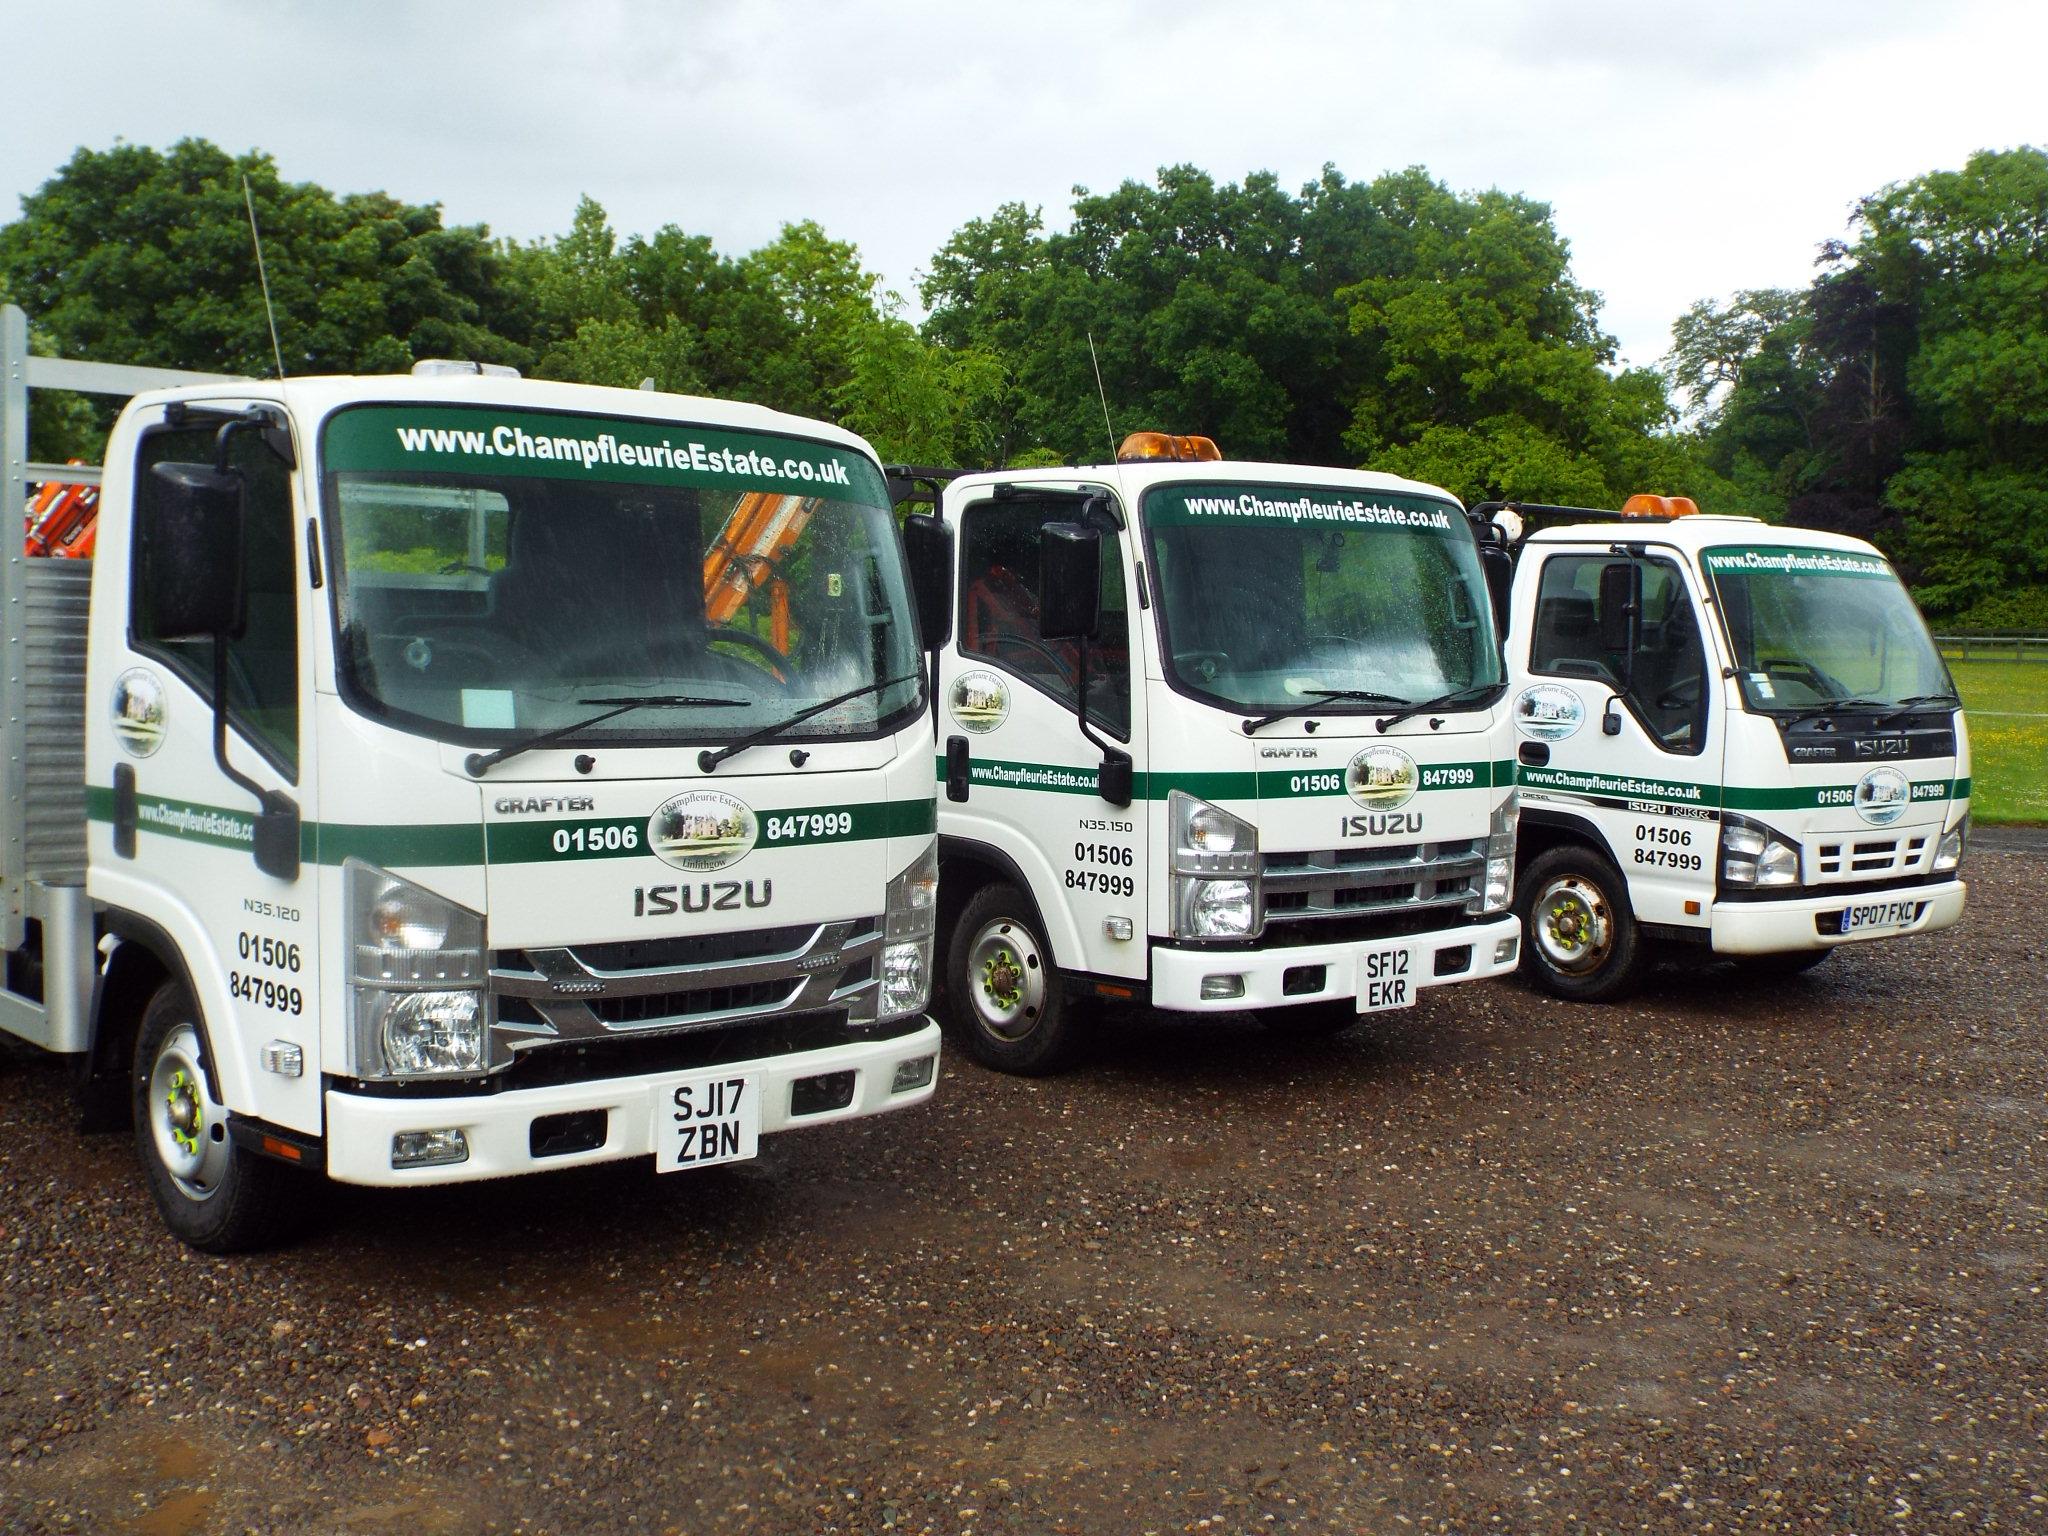 An image of Isuzu truck N35 Grafters belonging to customer Champfleurie Estate